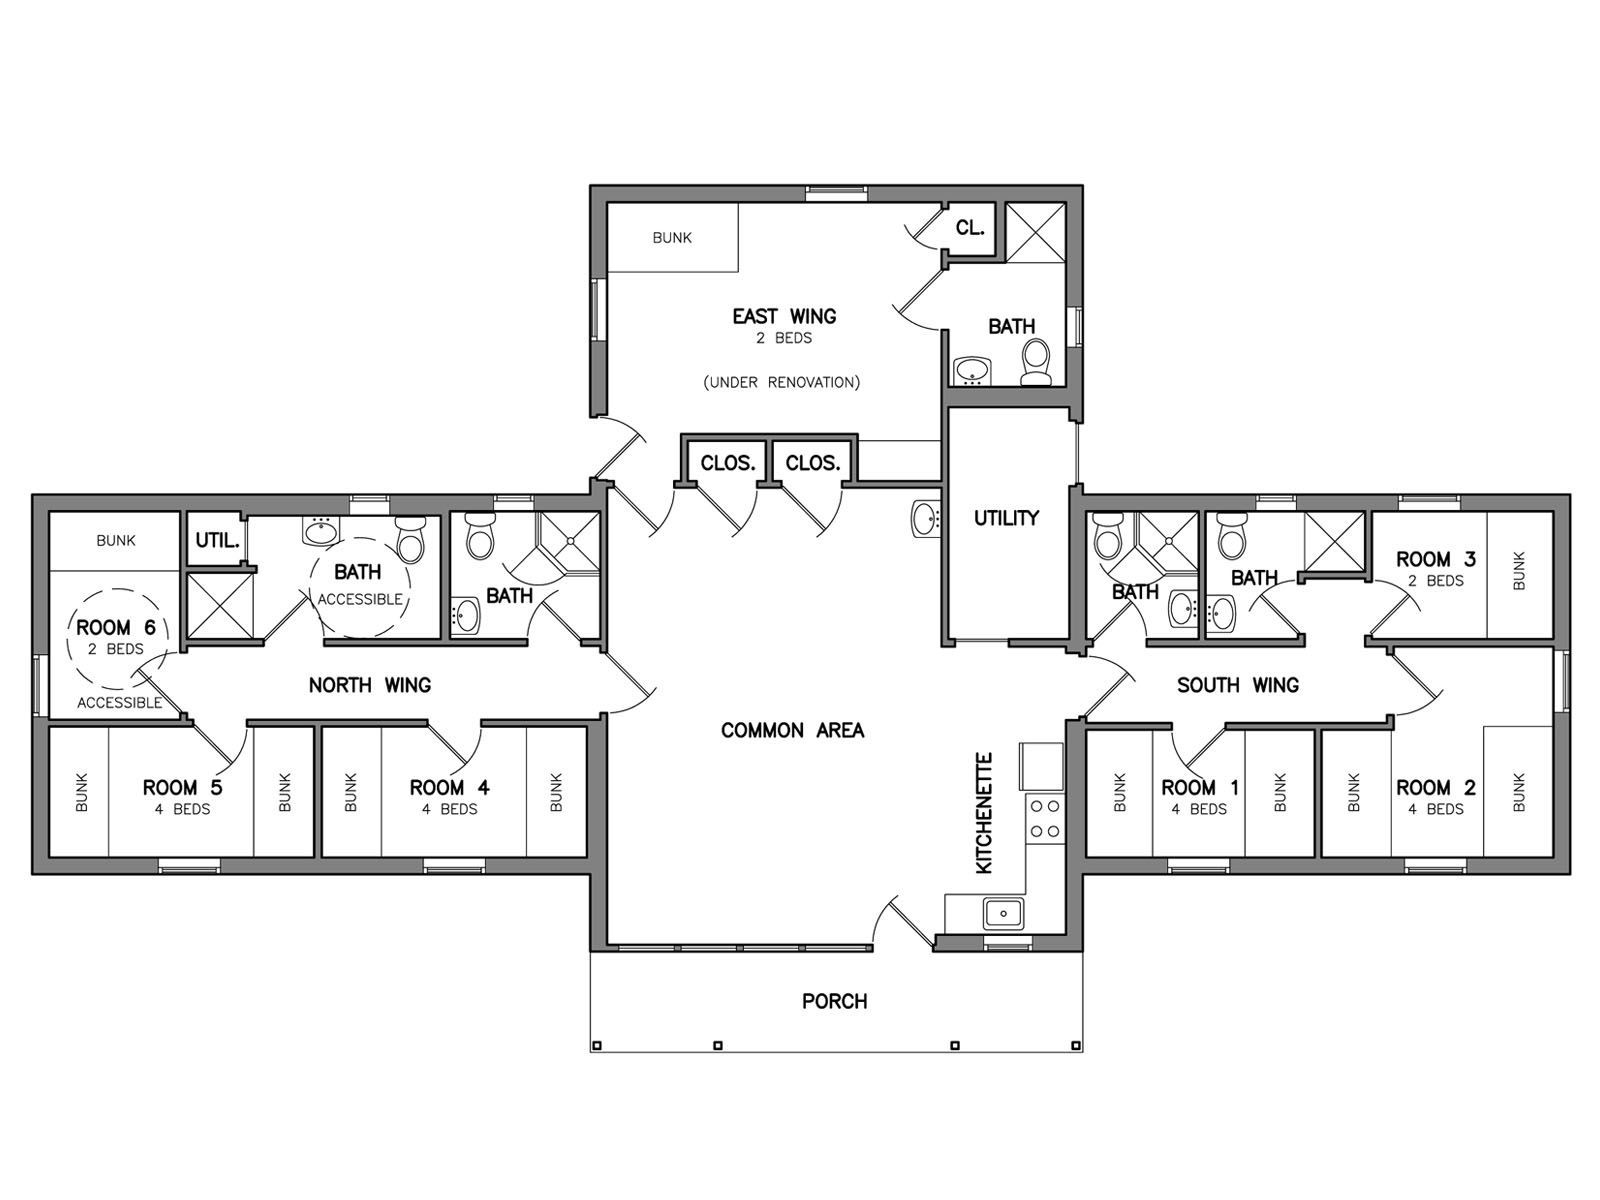 Hunting Lodge Floor Plans Lodges Johnsonburg Camp Amp Conference Center Of Hunting Lodge Floor Plans Floor Plans Guest House Plans Floor Plan Layout